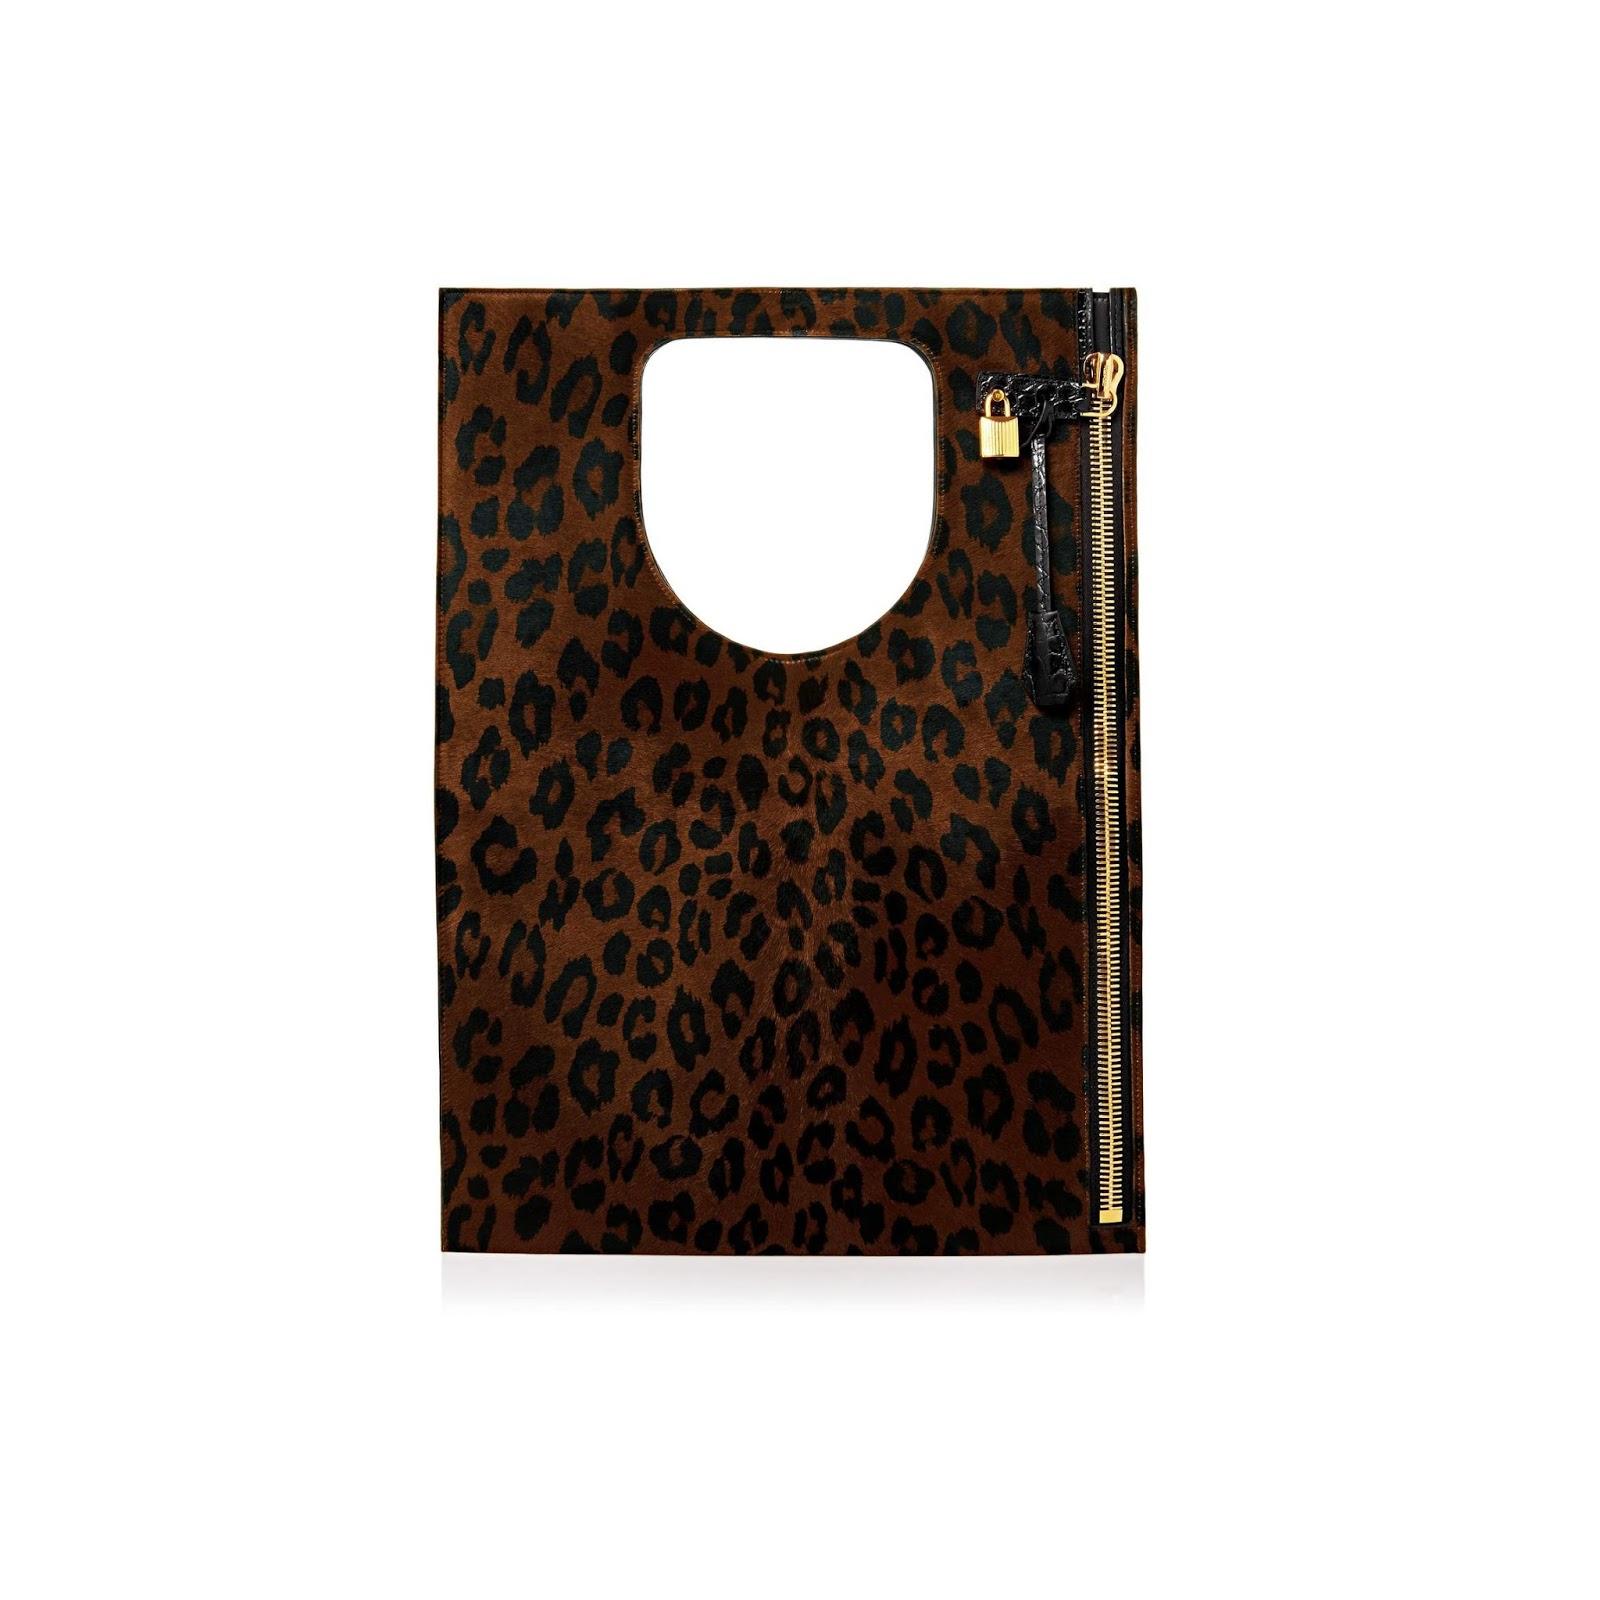 Tom Ford Alix Handbag Collection